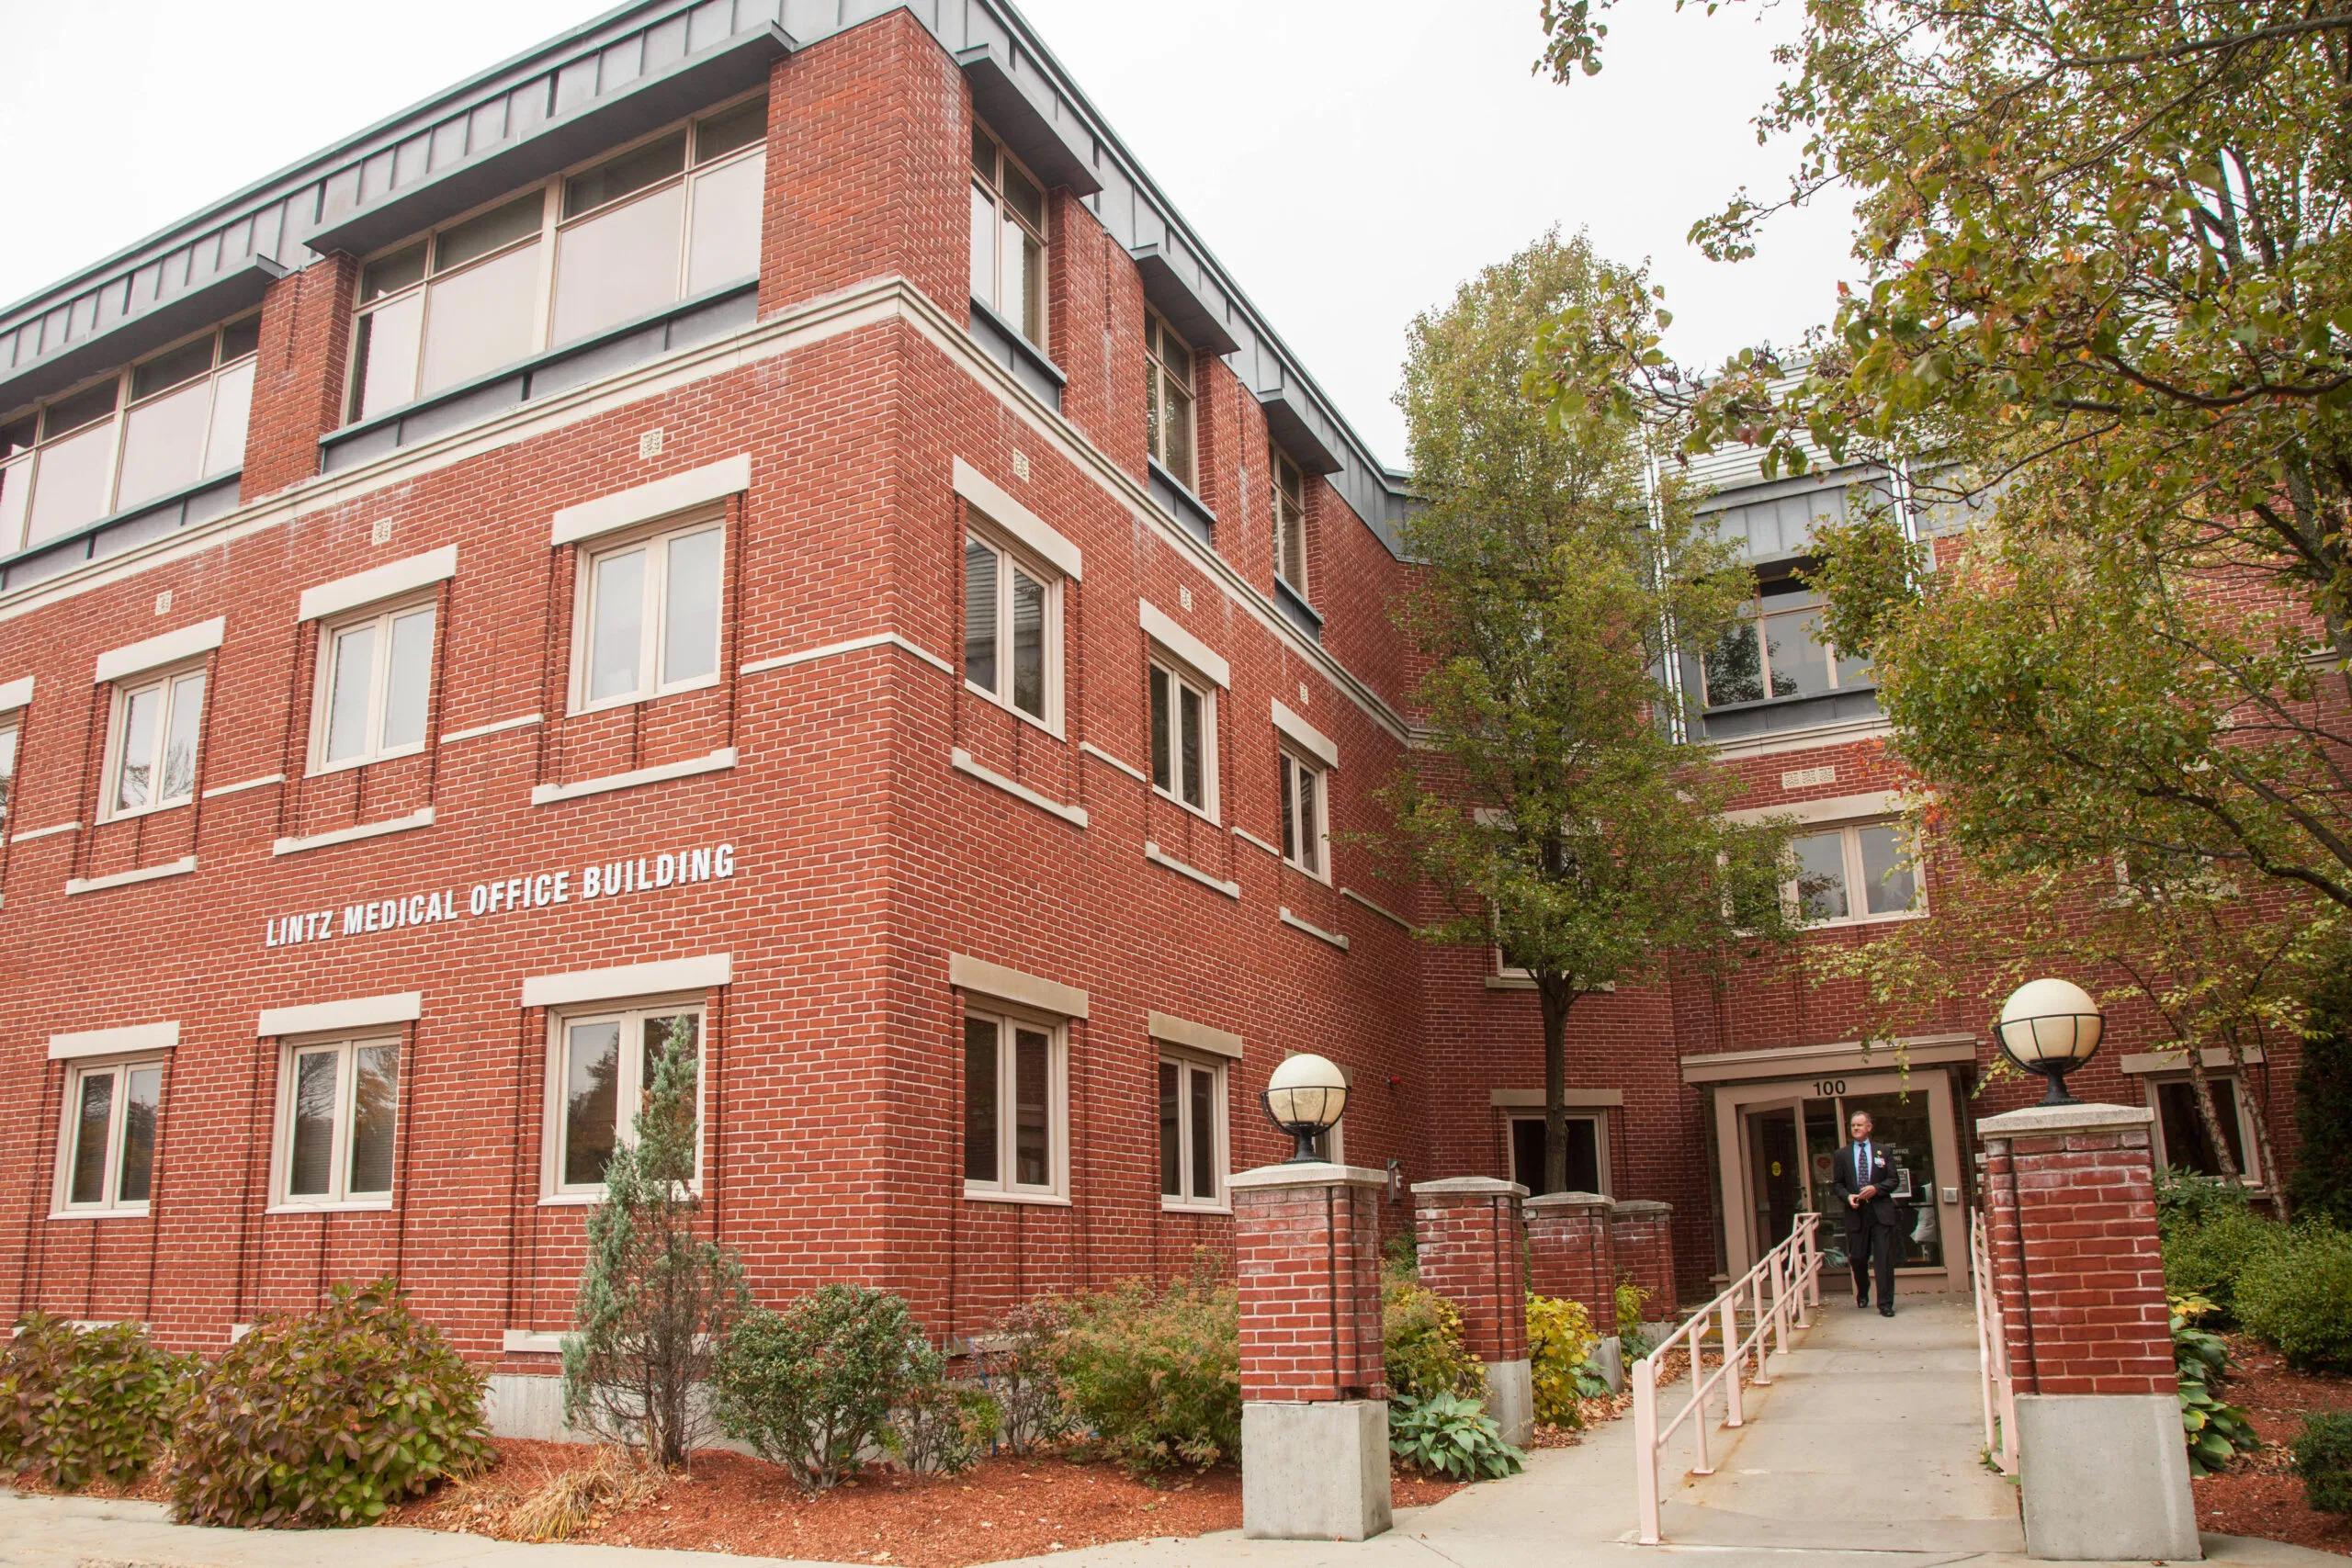 Milton-building-exterior-hi-res-copy-scaled